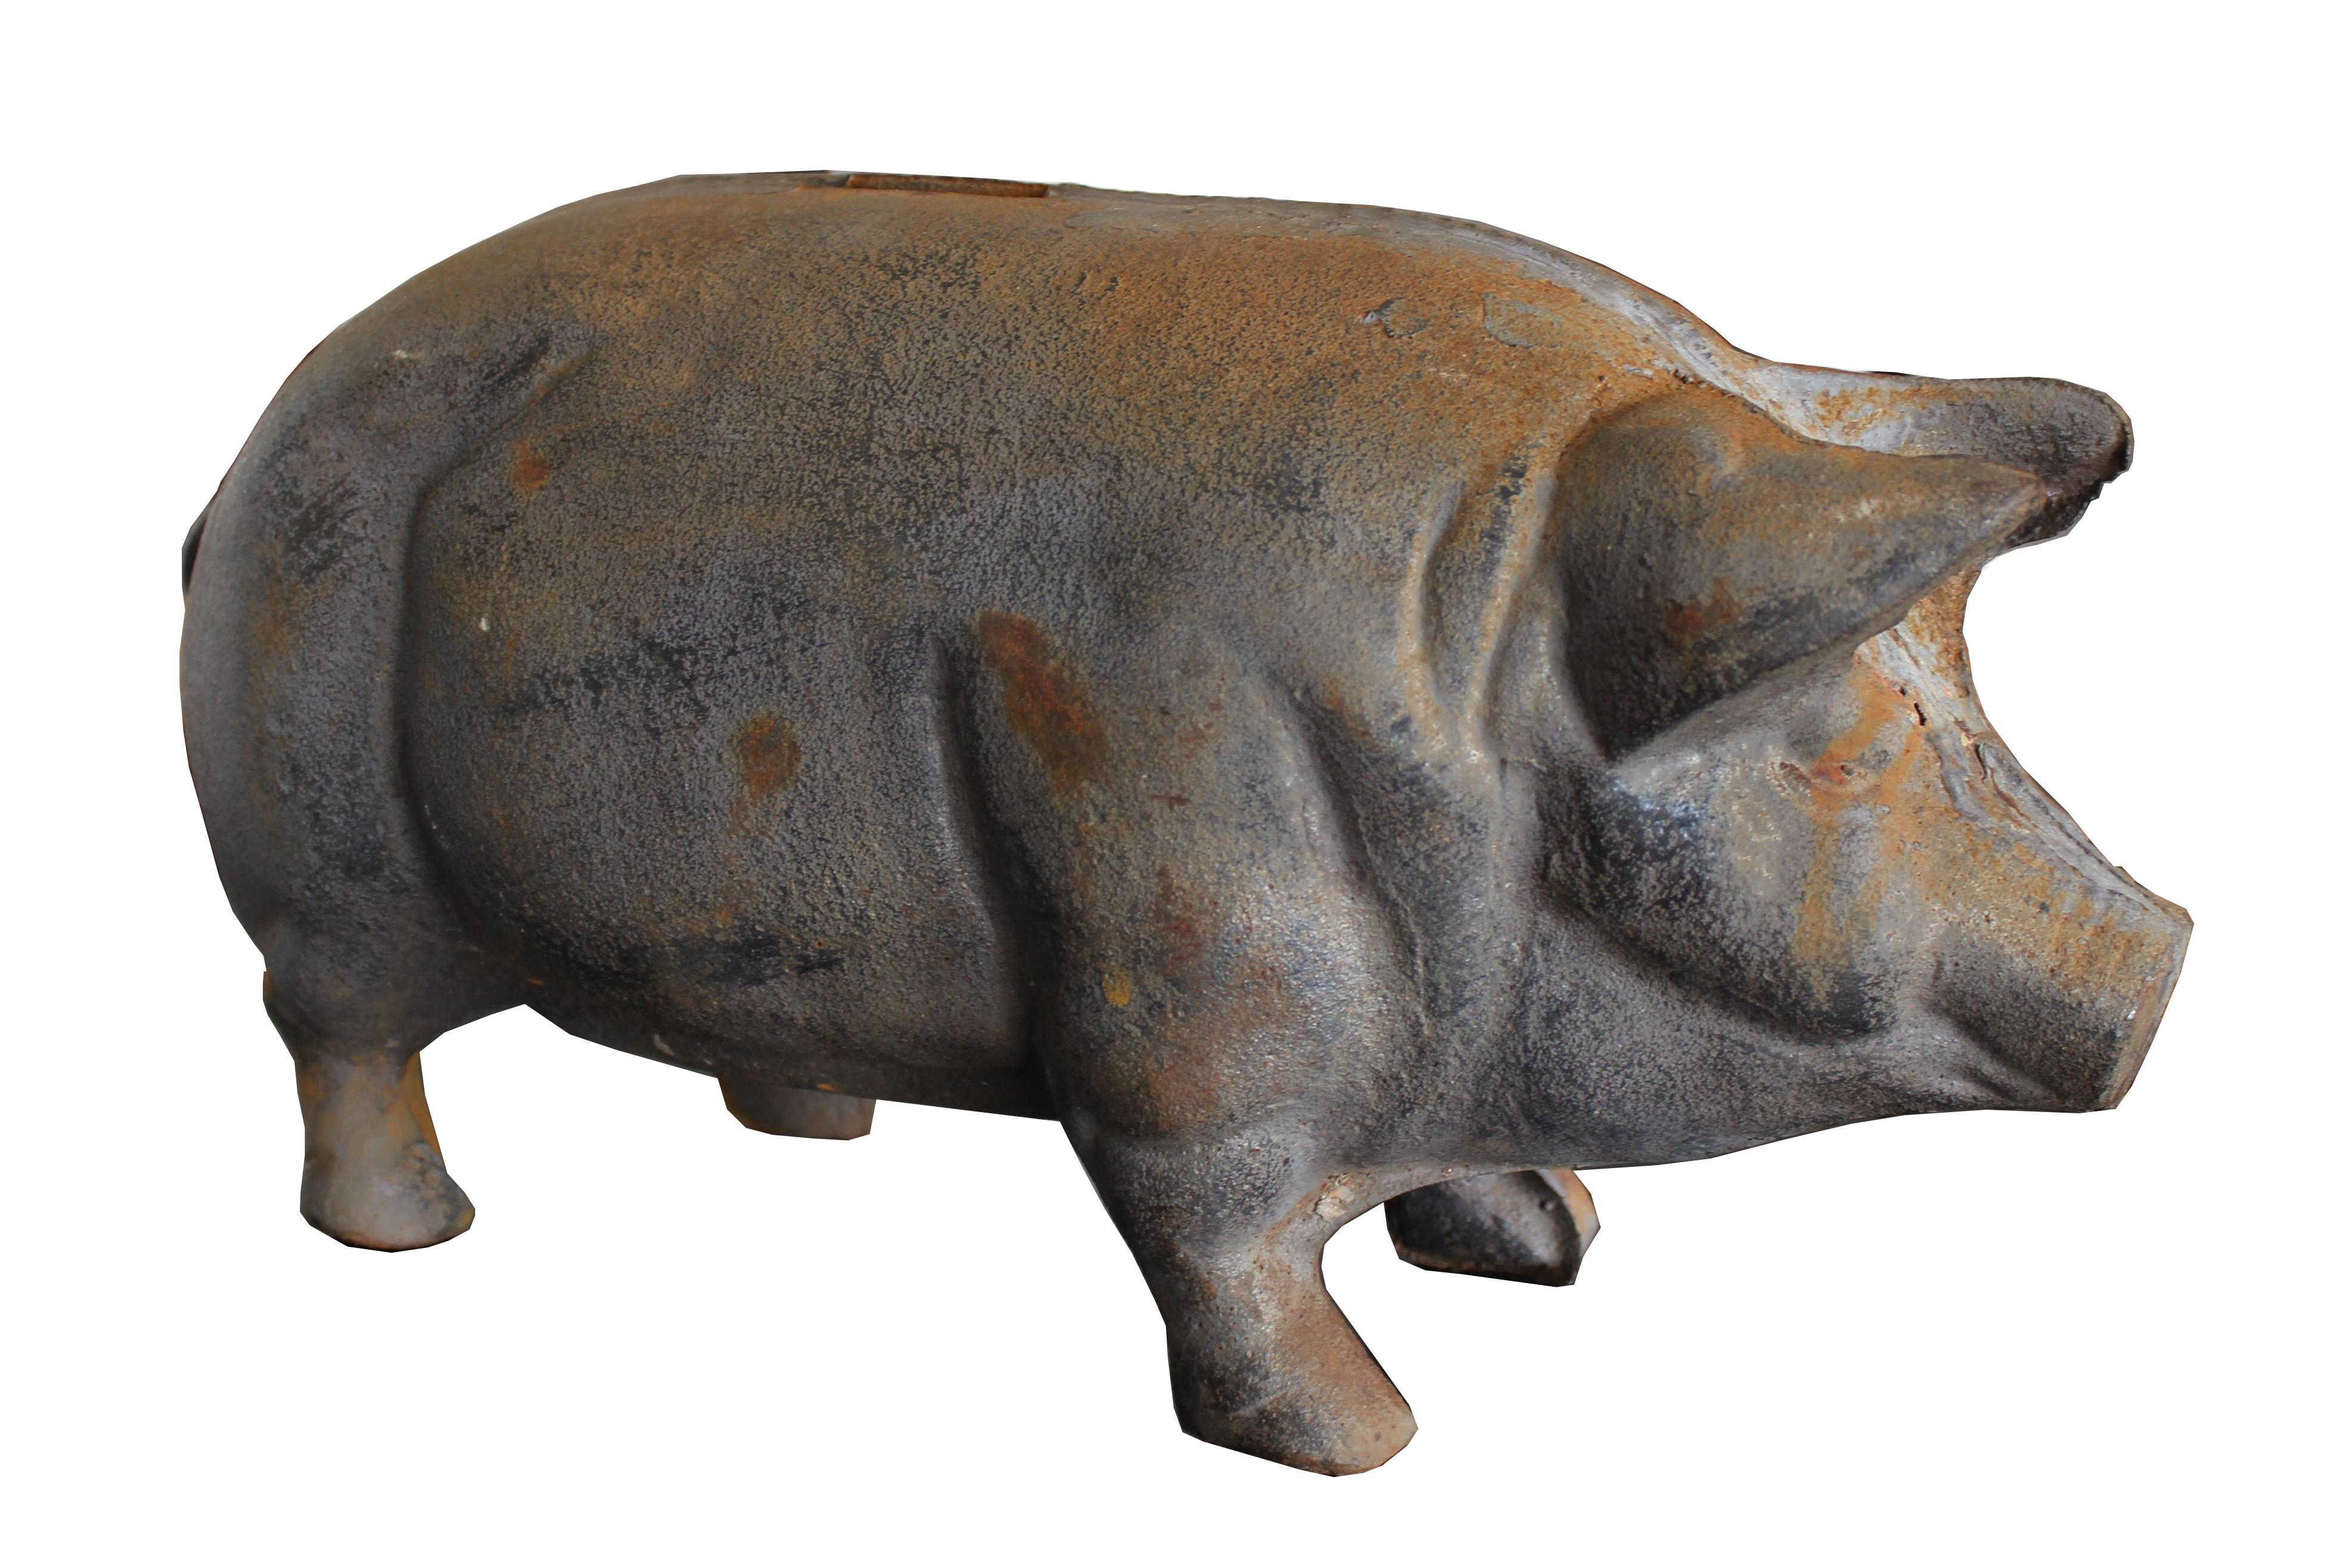 Antique Large Cast Iron Pig Bank Chairish